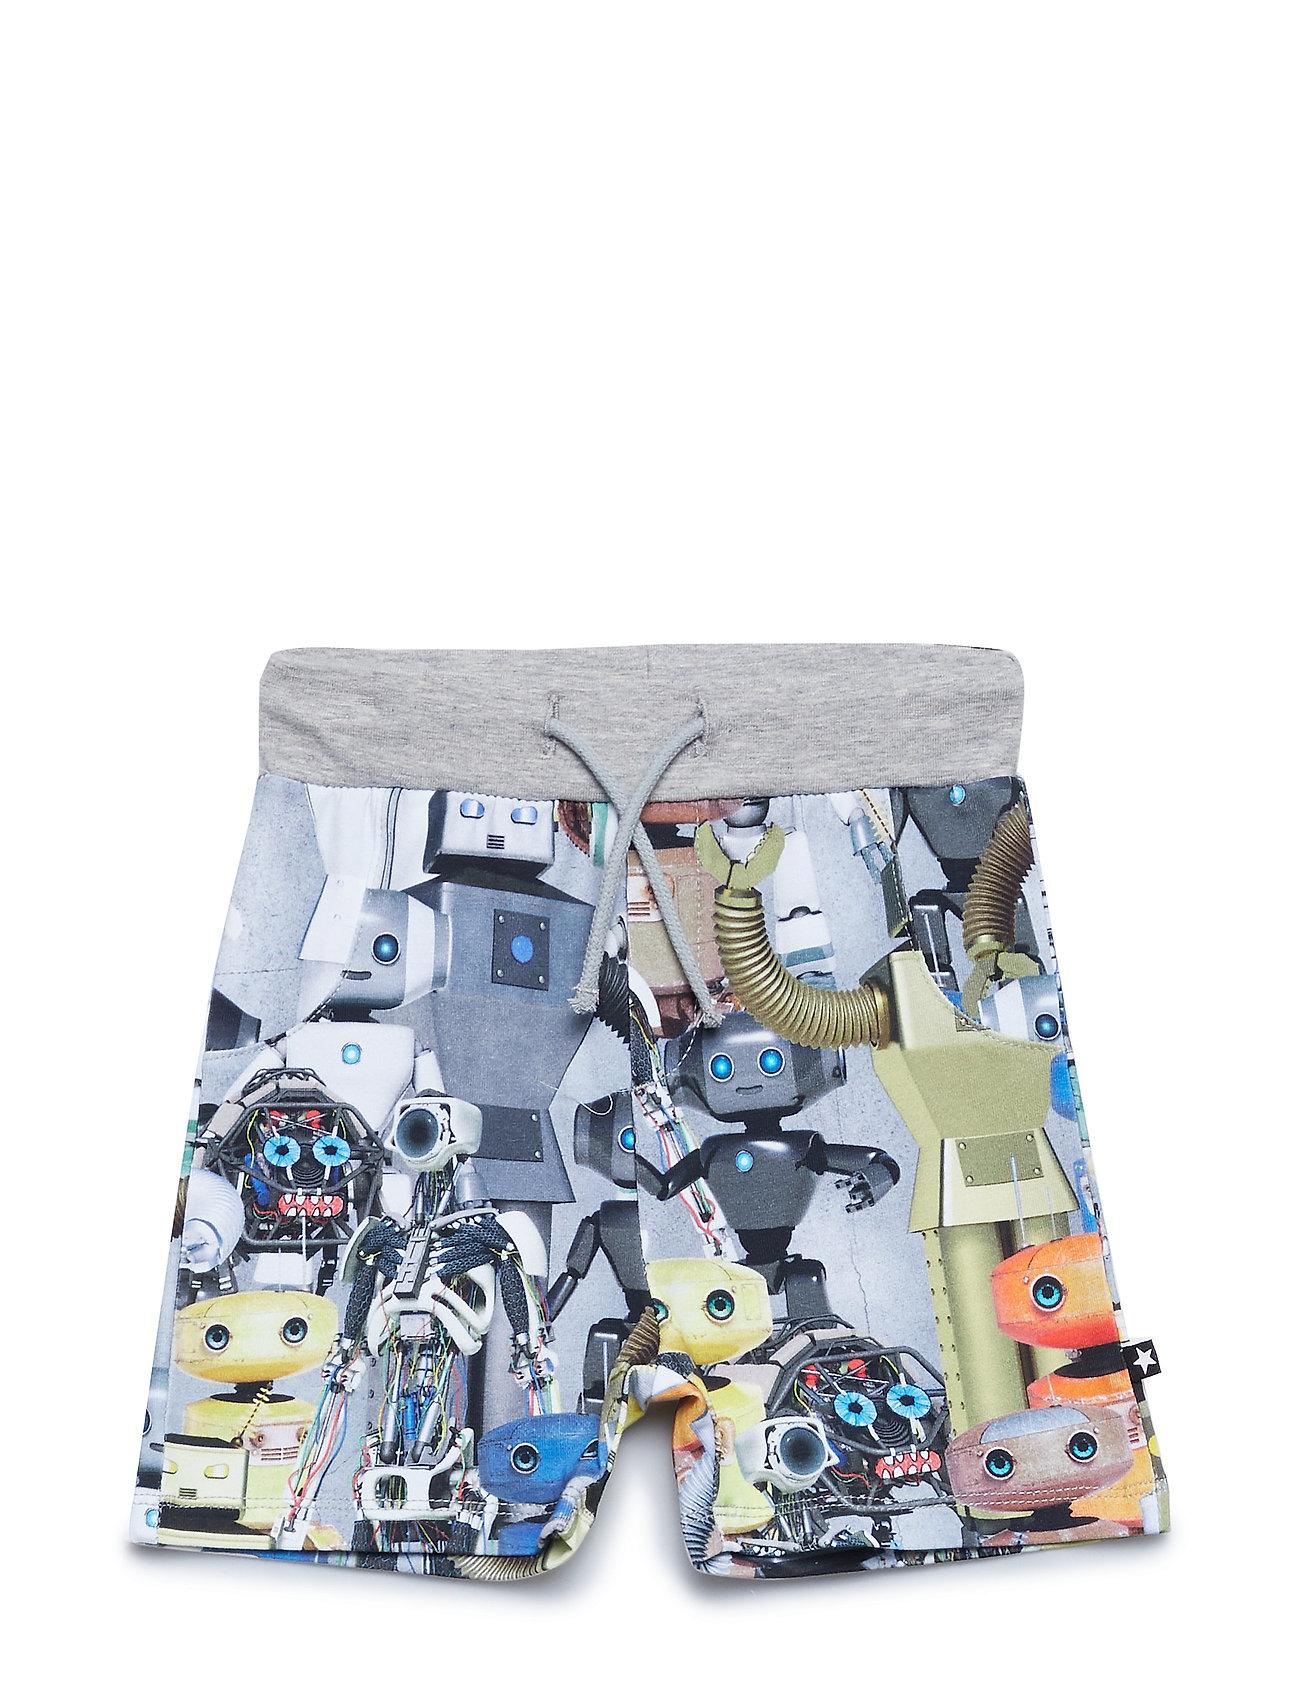 Molo Simroy - ROBOTS